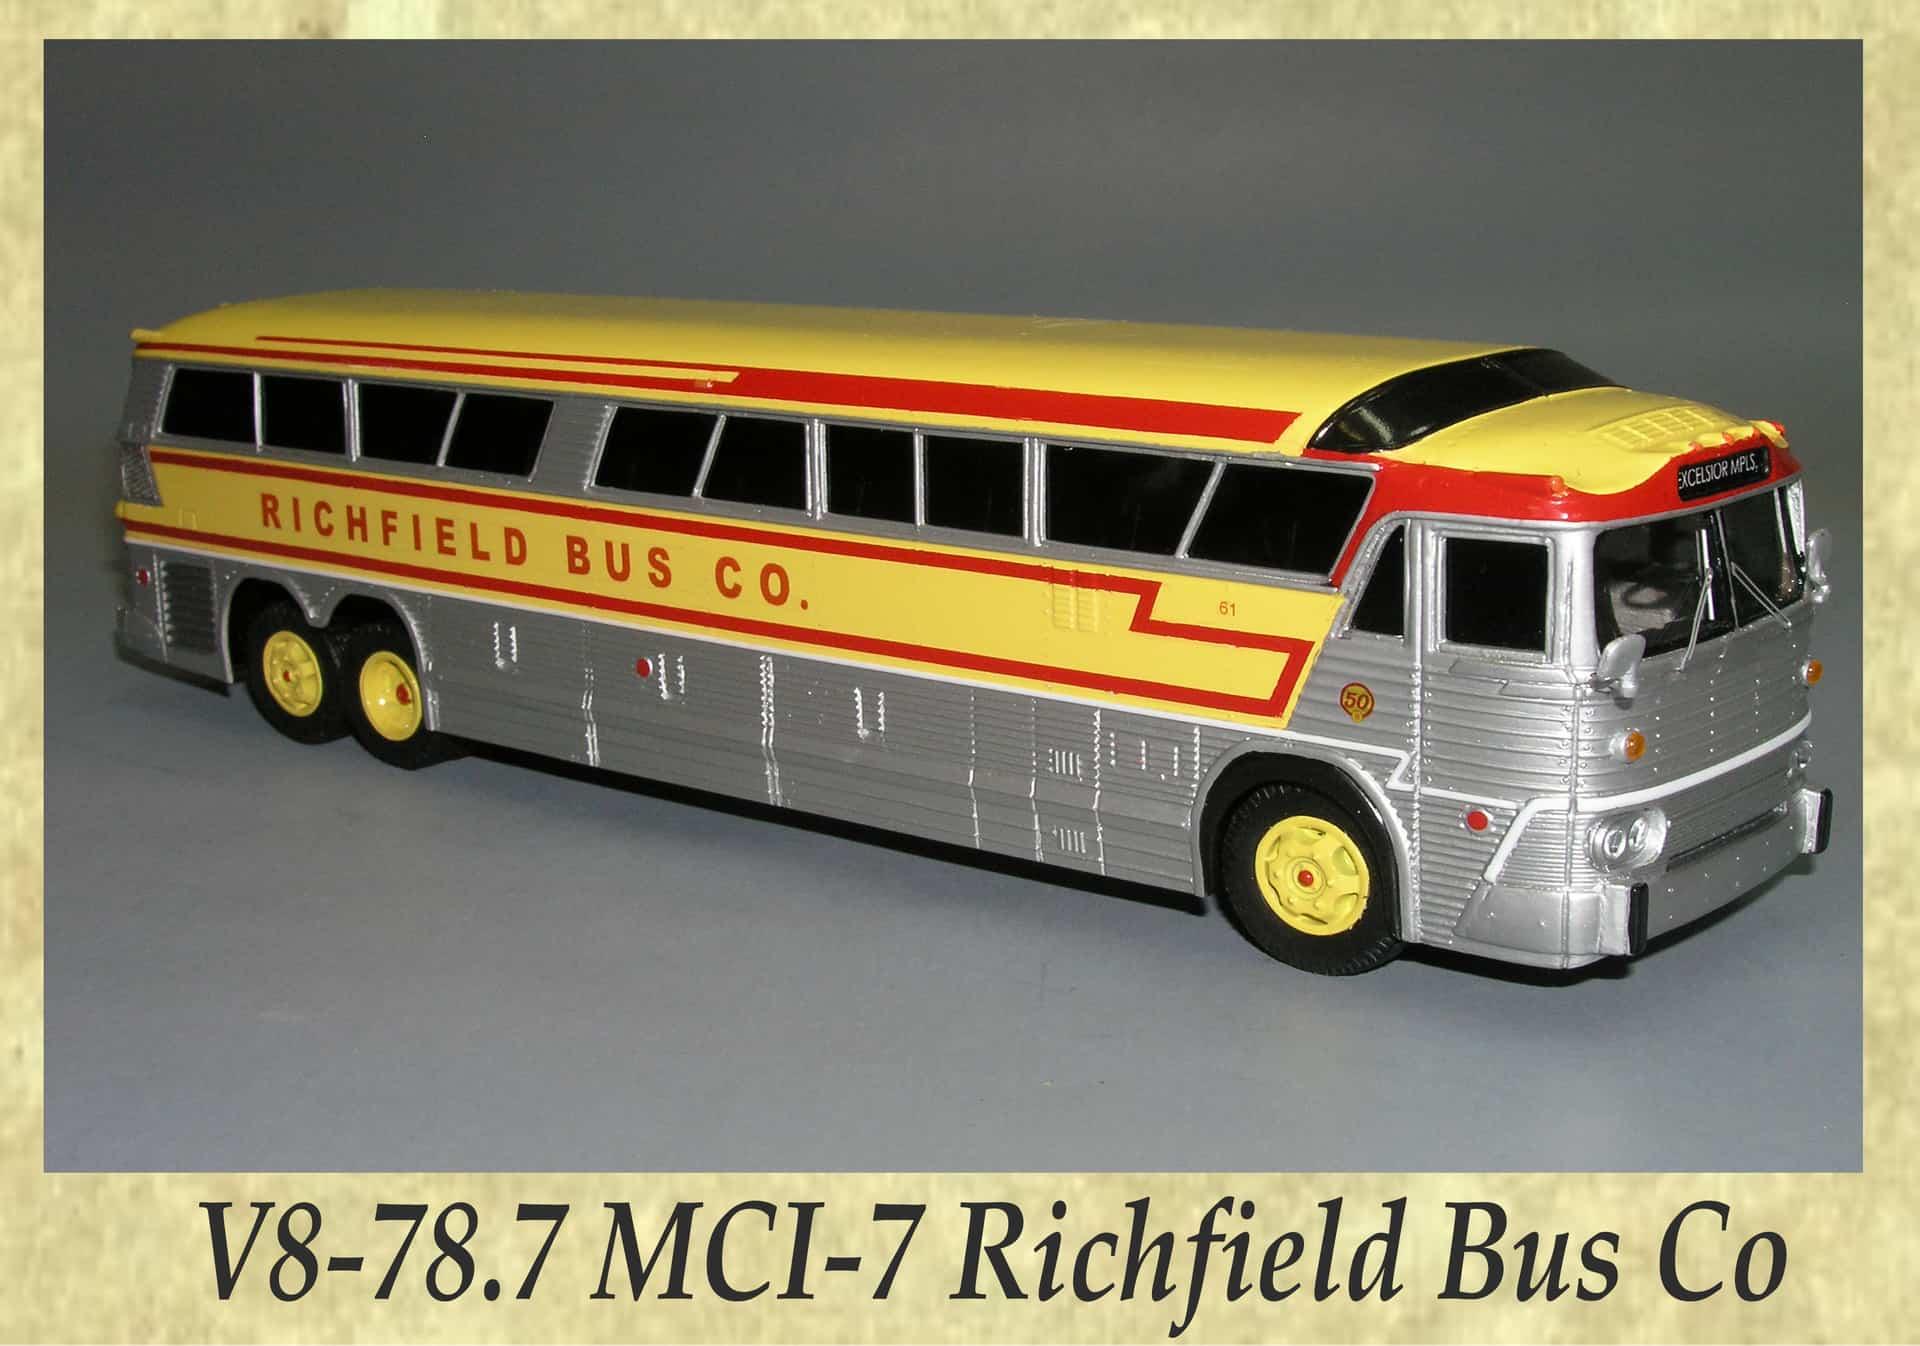 V8-78.7 MCI-7 Richfield Bus Co